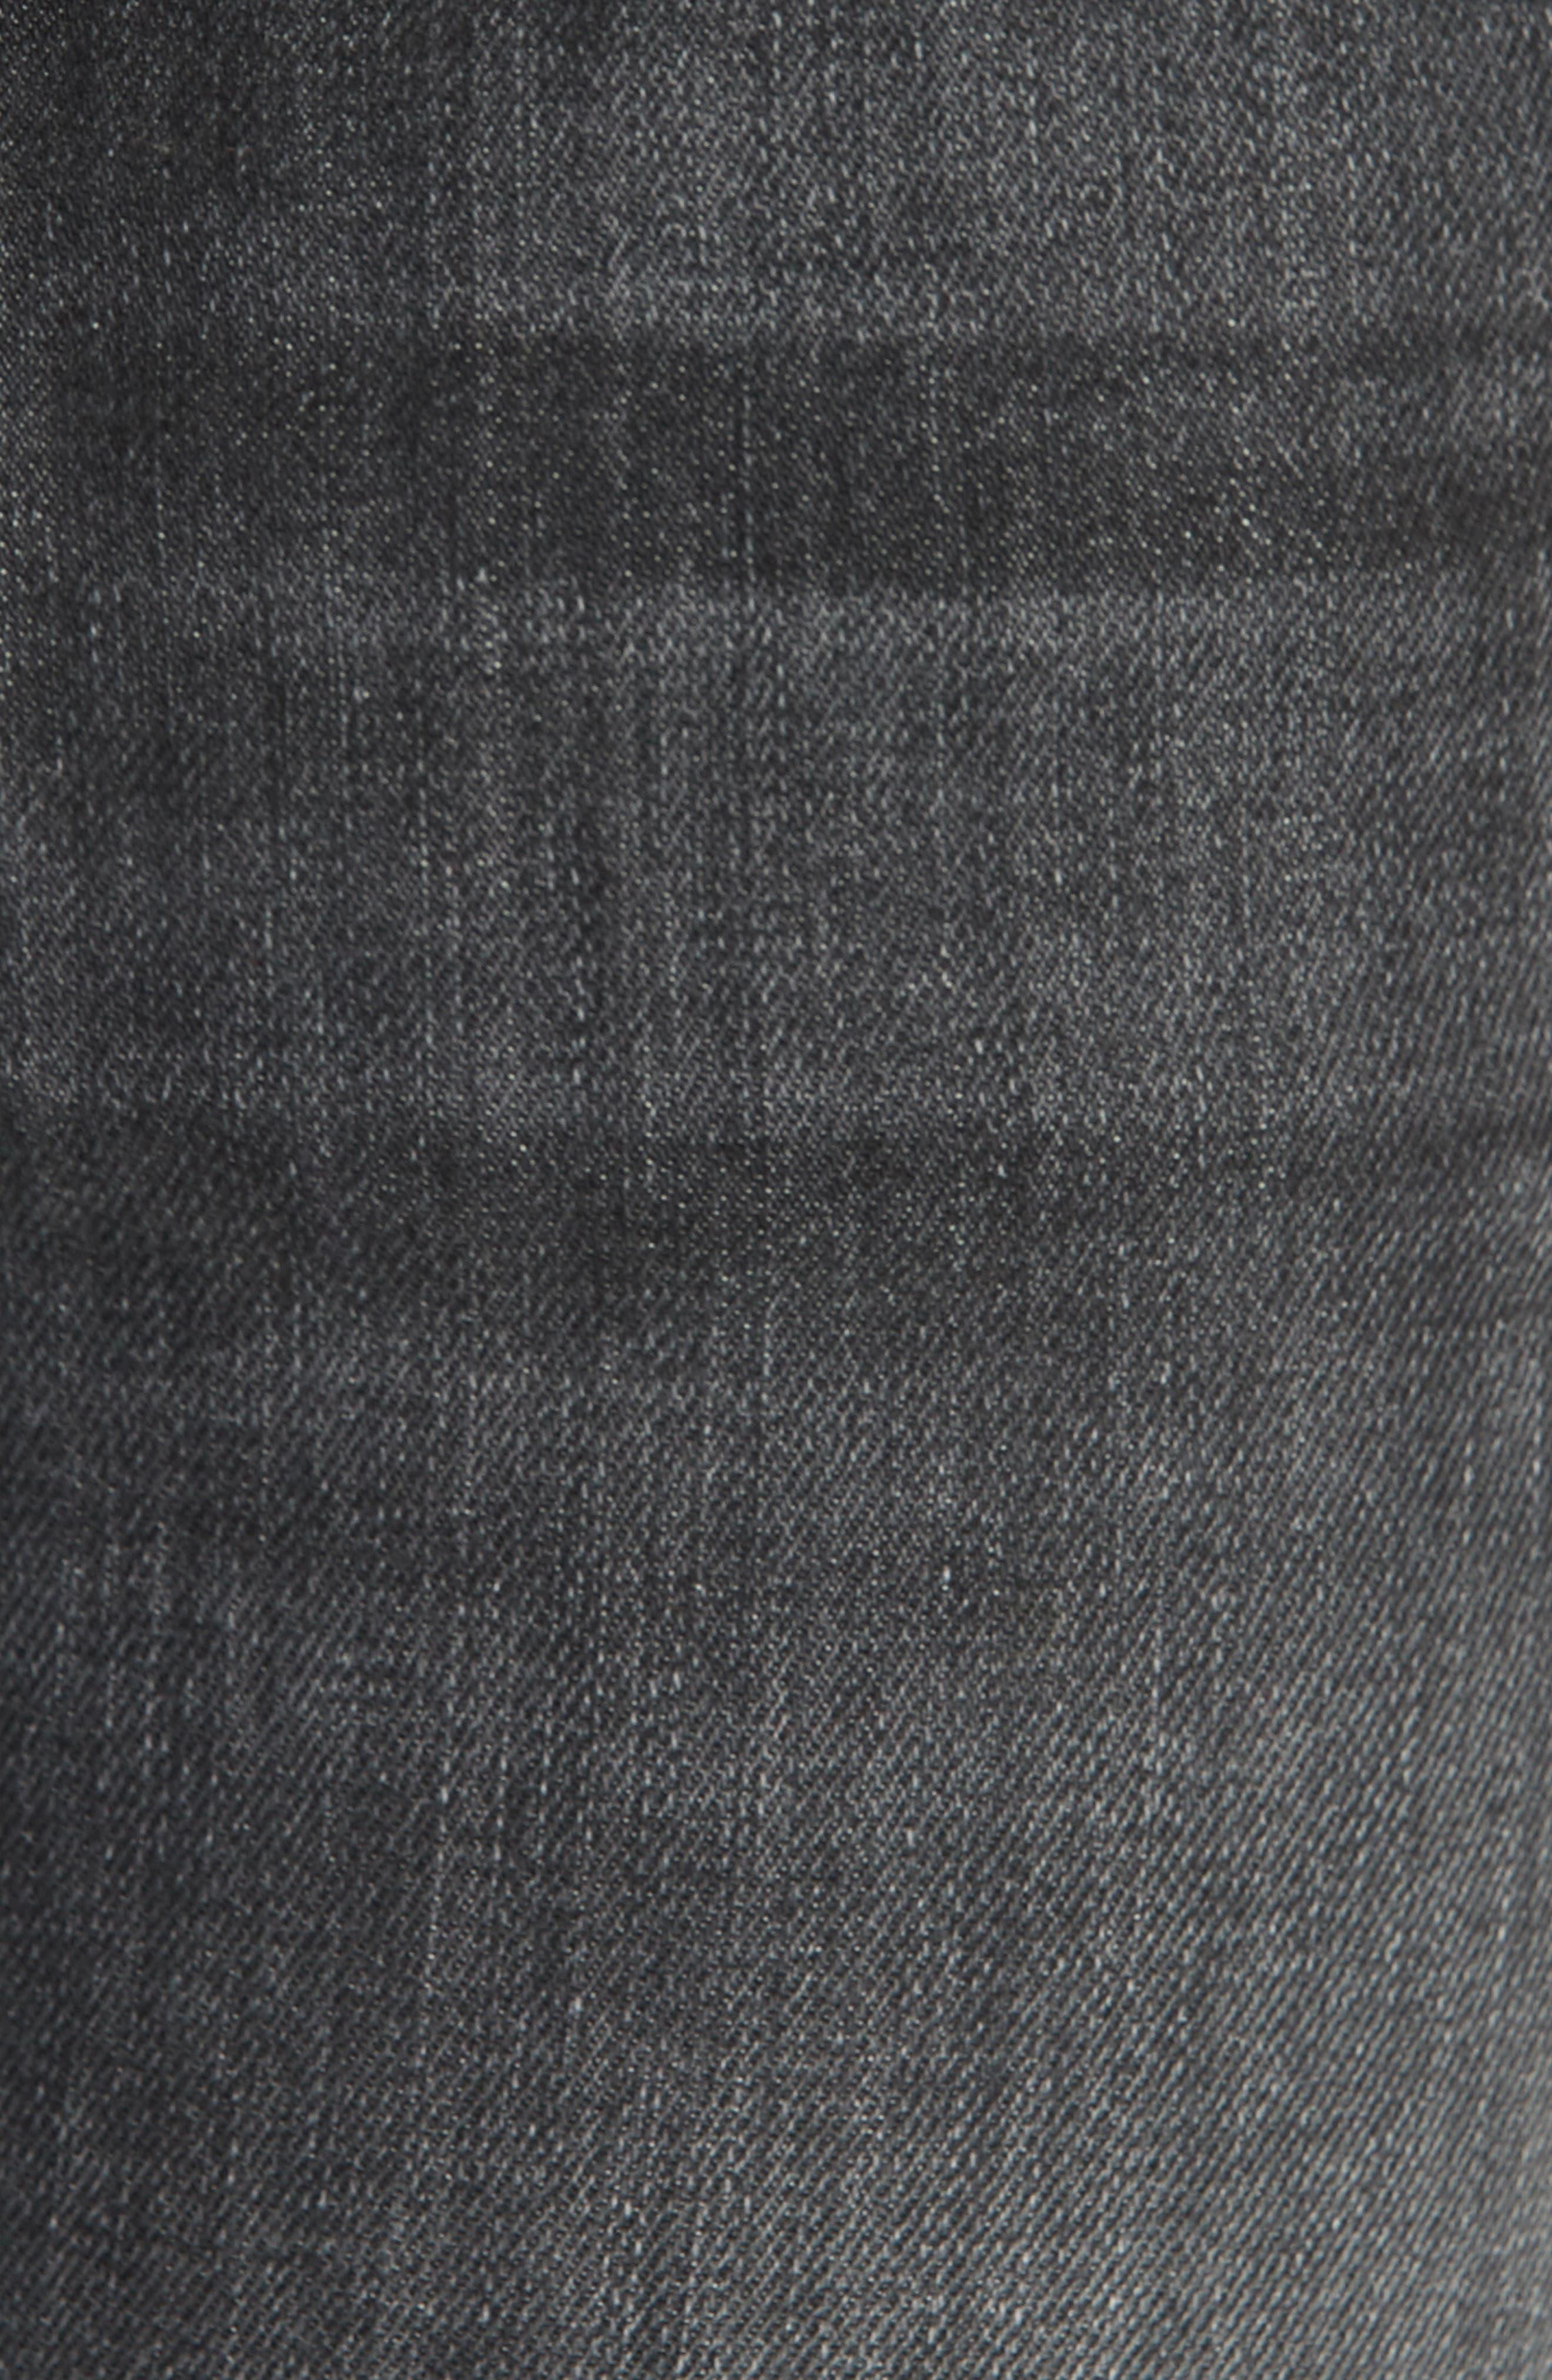 RAG & BONE, High Waist Raw Hem Crop Skinny Jeans, Alternate thumbnail 5, color, BRANDI